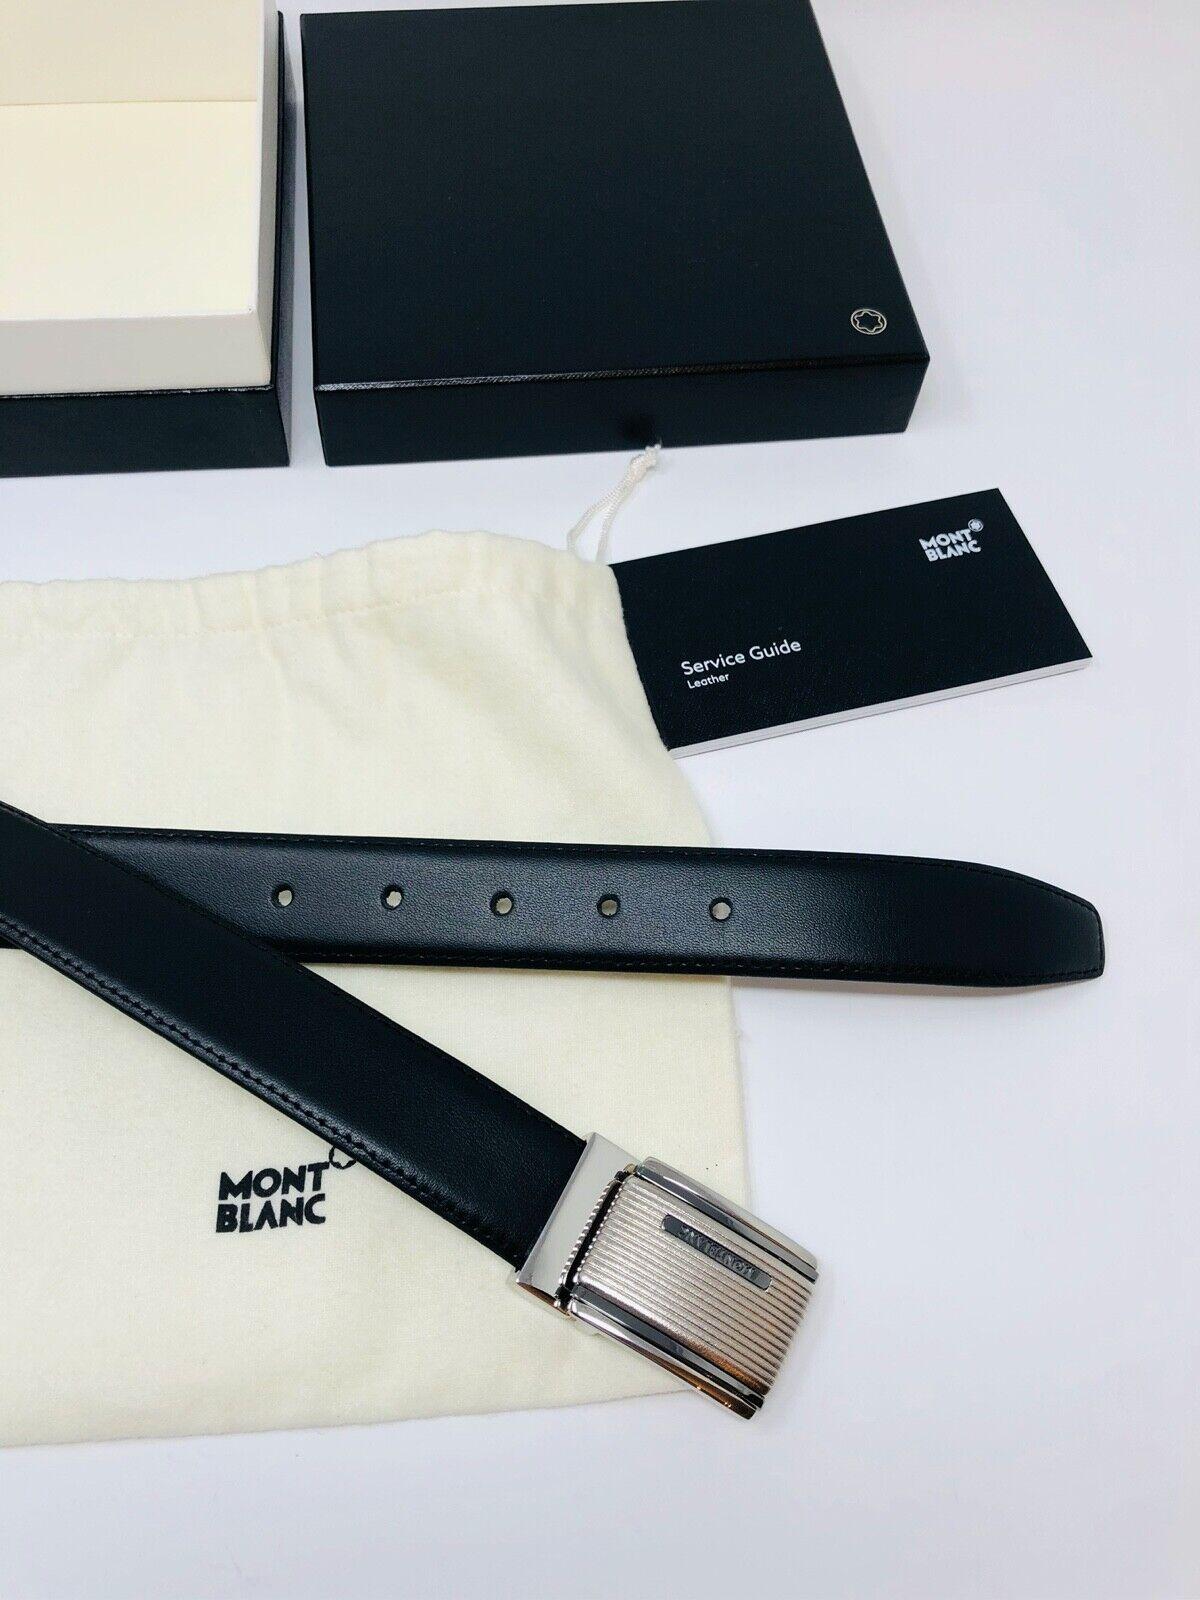 MONTBLANC *MST* Leder Riemen + Gürtel 125 x 3 cm Belts schwarz NP:395 -1720